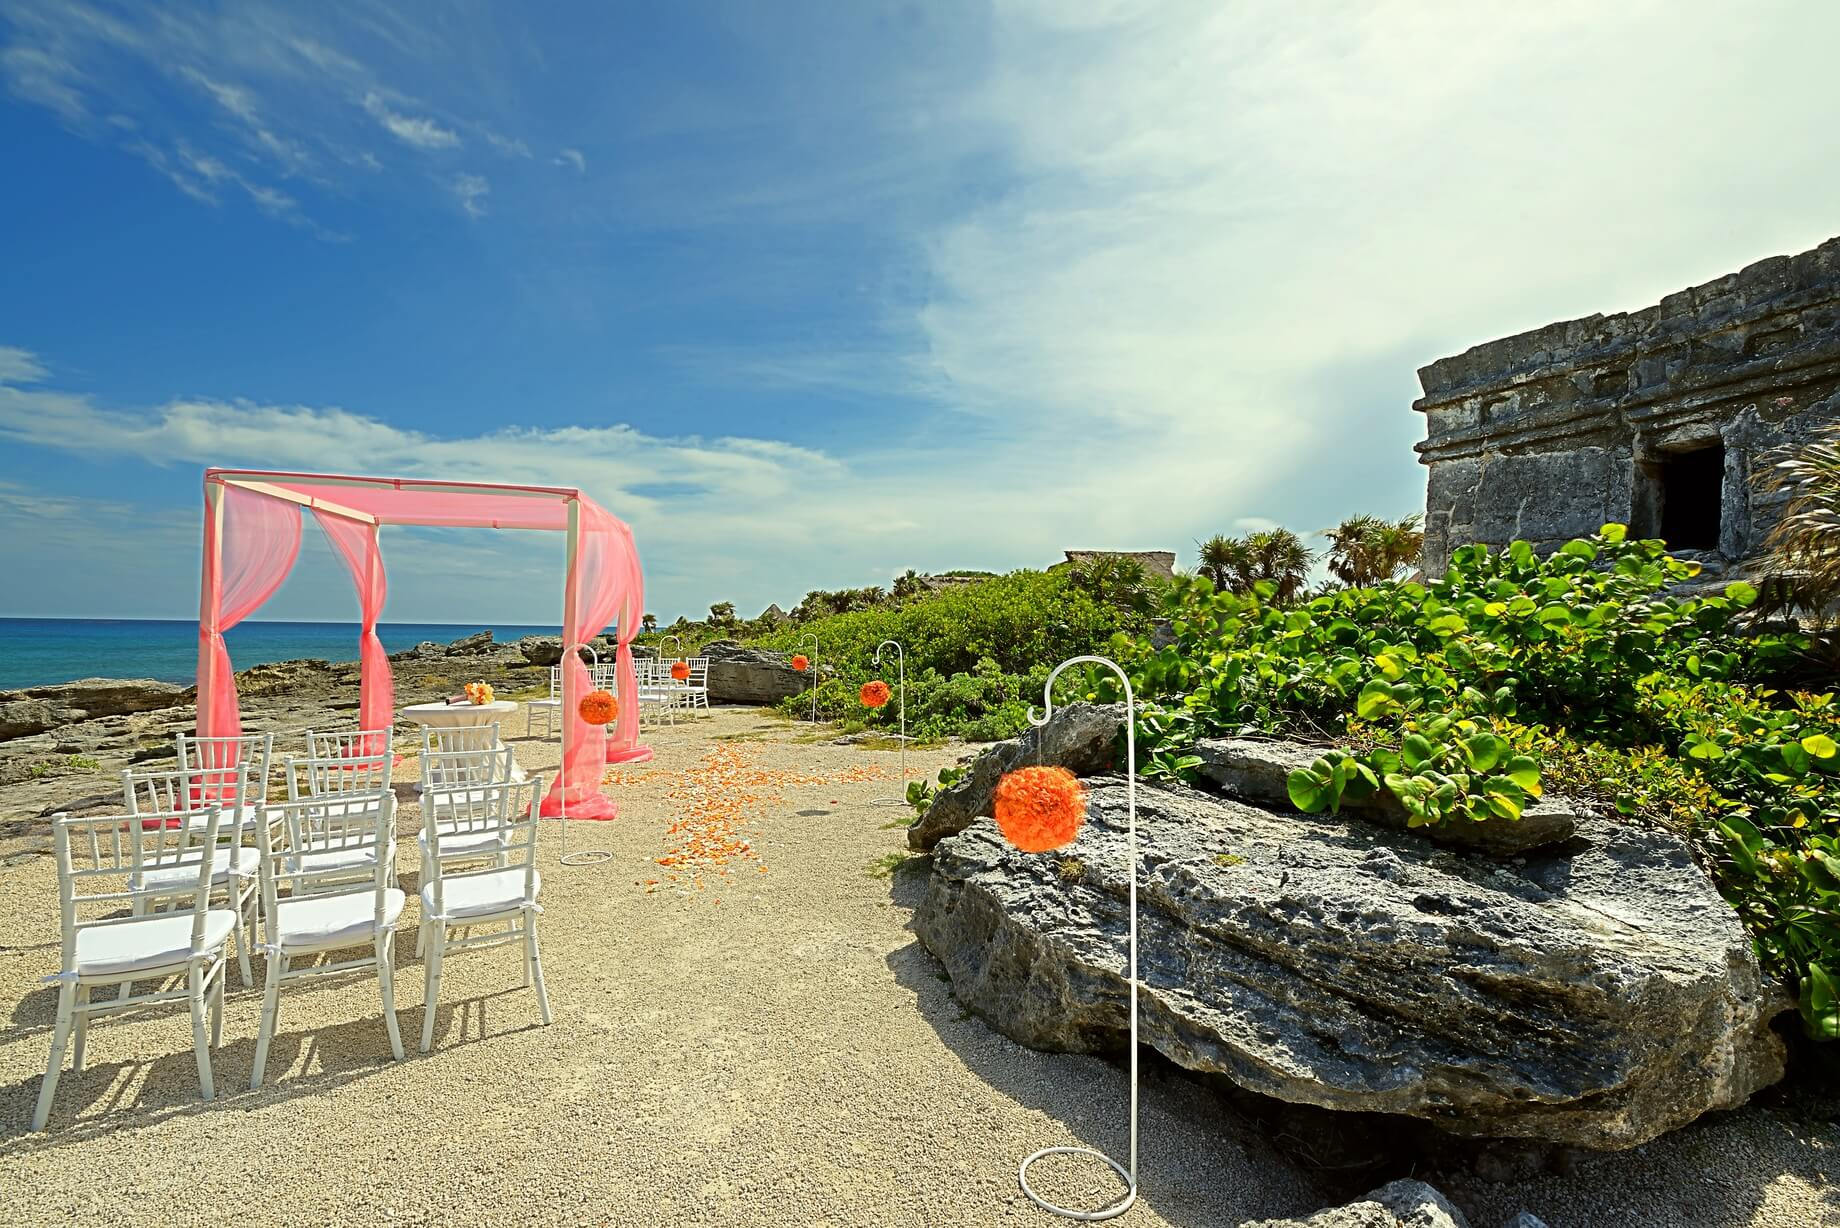 mayan wedding ceremony at xcaret in Playa del Carmen